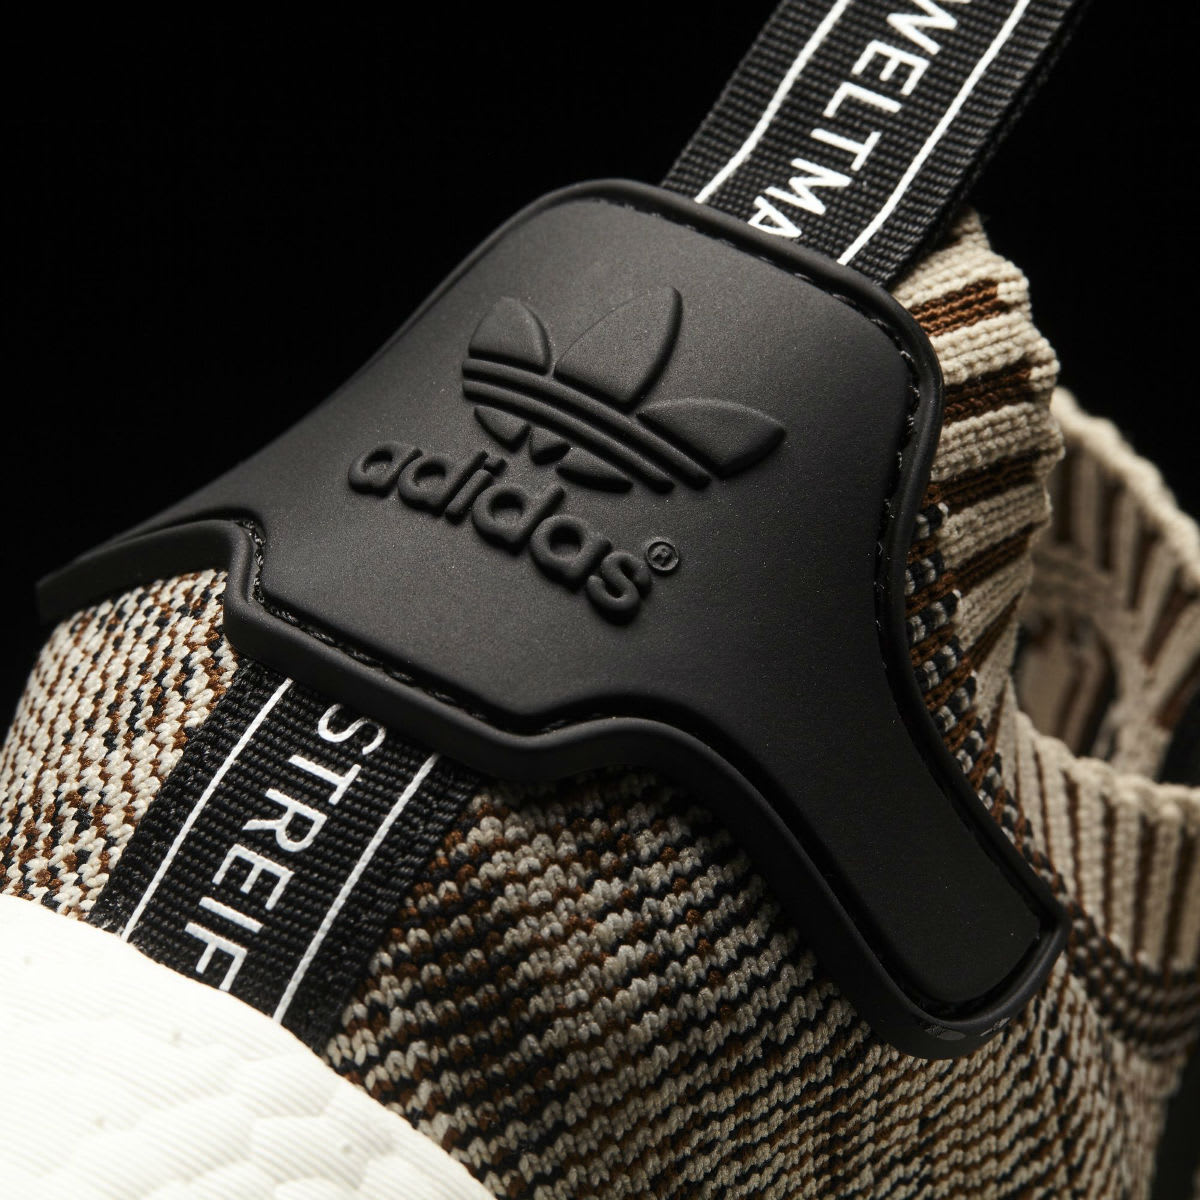 Adidas NMD R1 Primeknit Core Black Orange Release Date Heel CQ1862